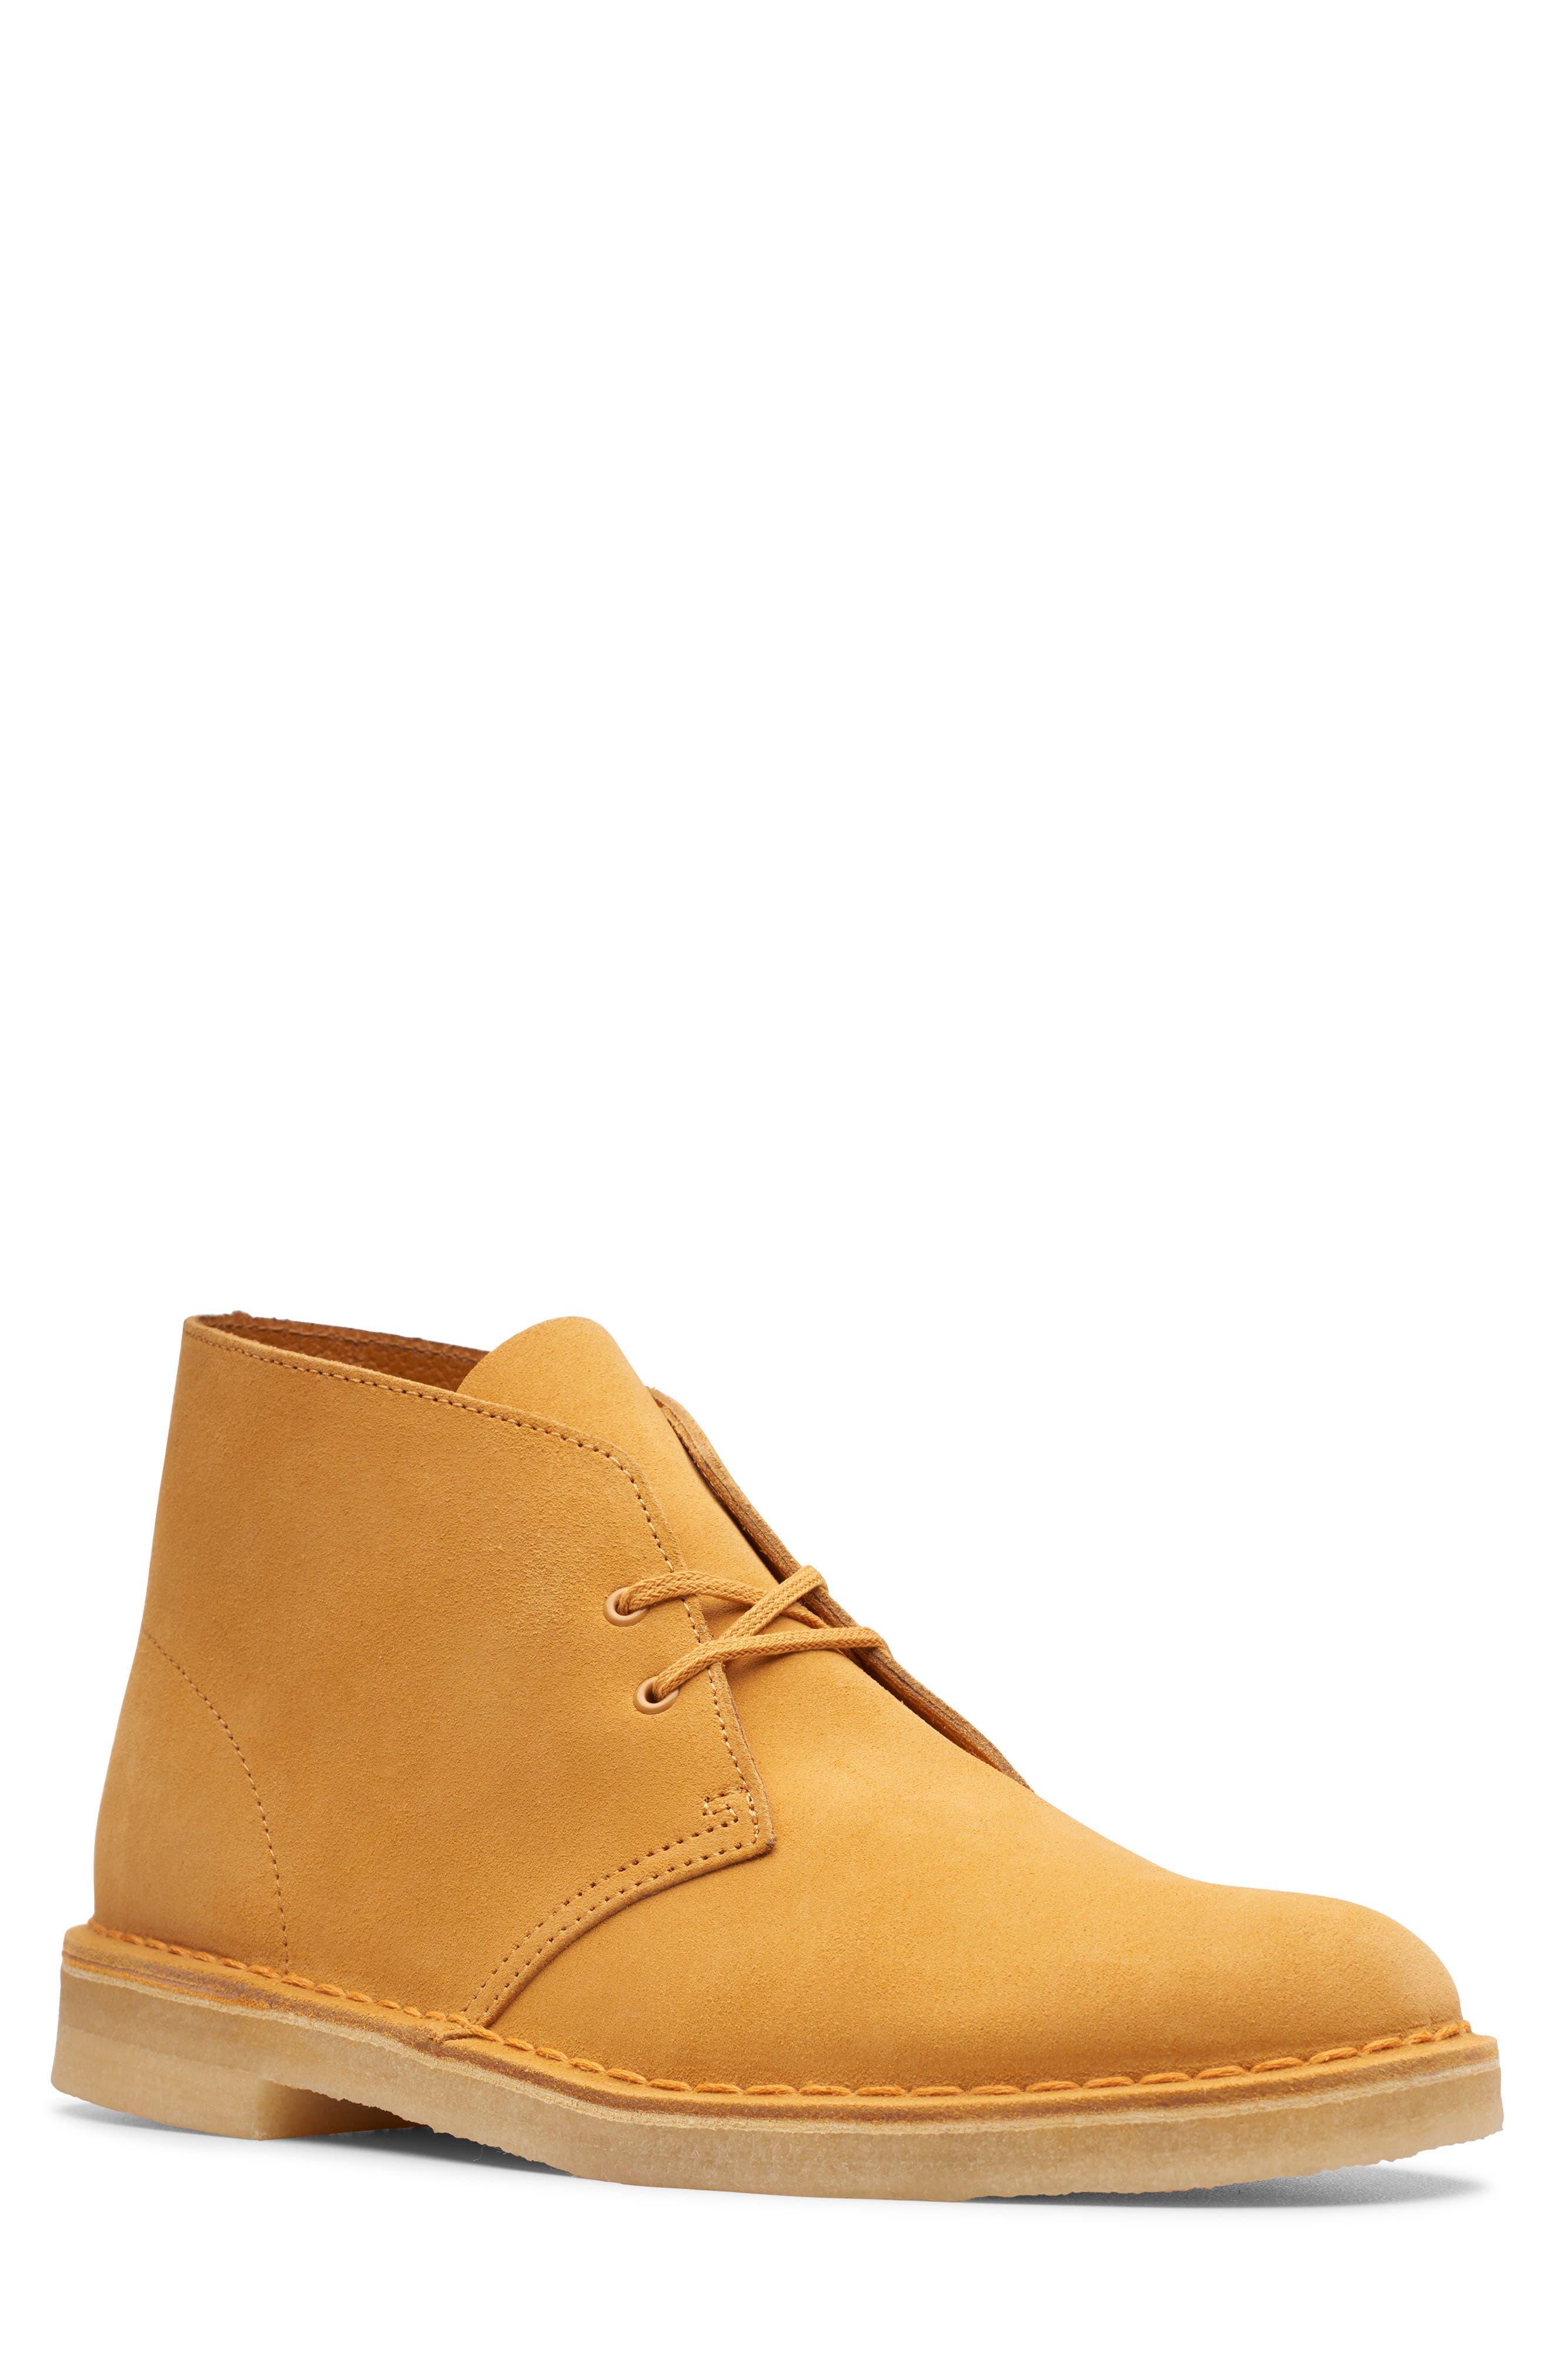 CLARKS<SUP>®</SUP>,                             Originals 'Desert' Boot,                             Main thumbnail 1, color,                             TURMERIC/BROWN SUEDE